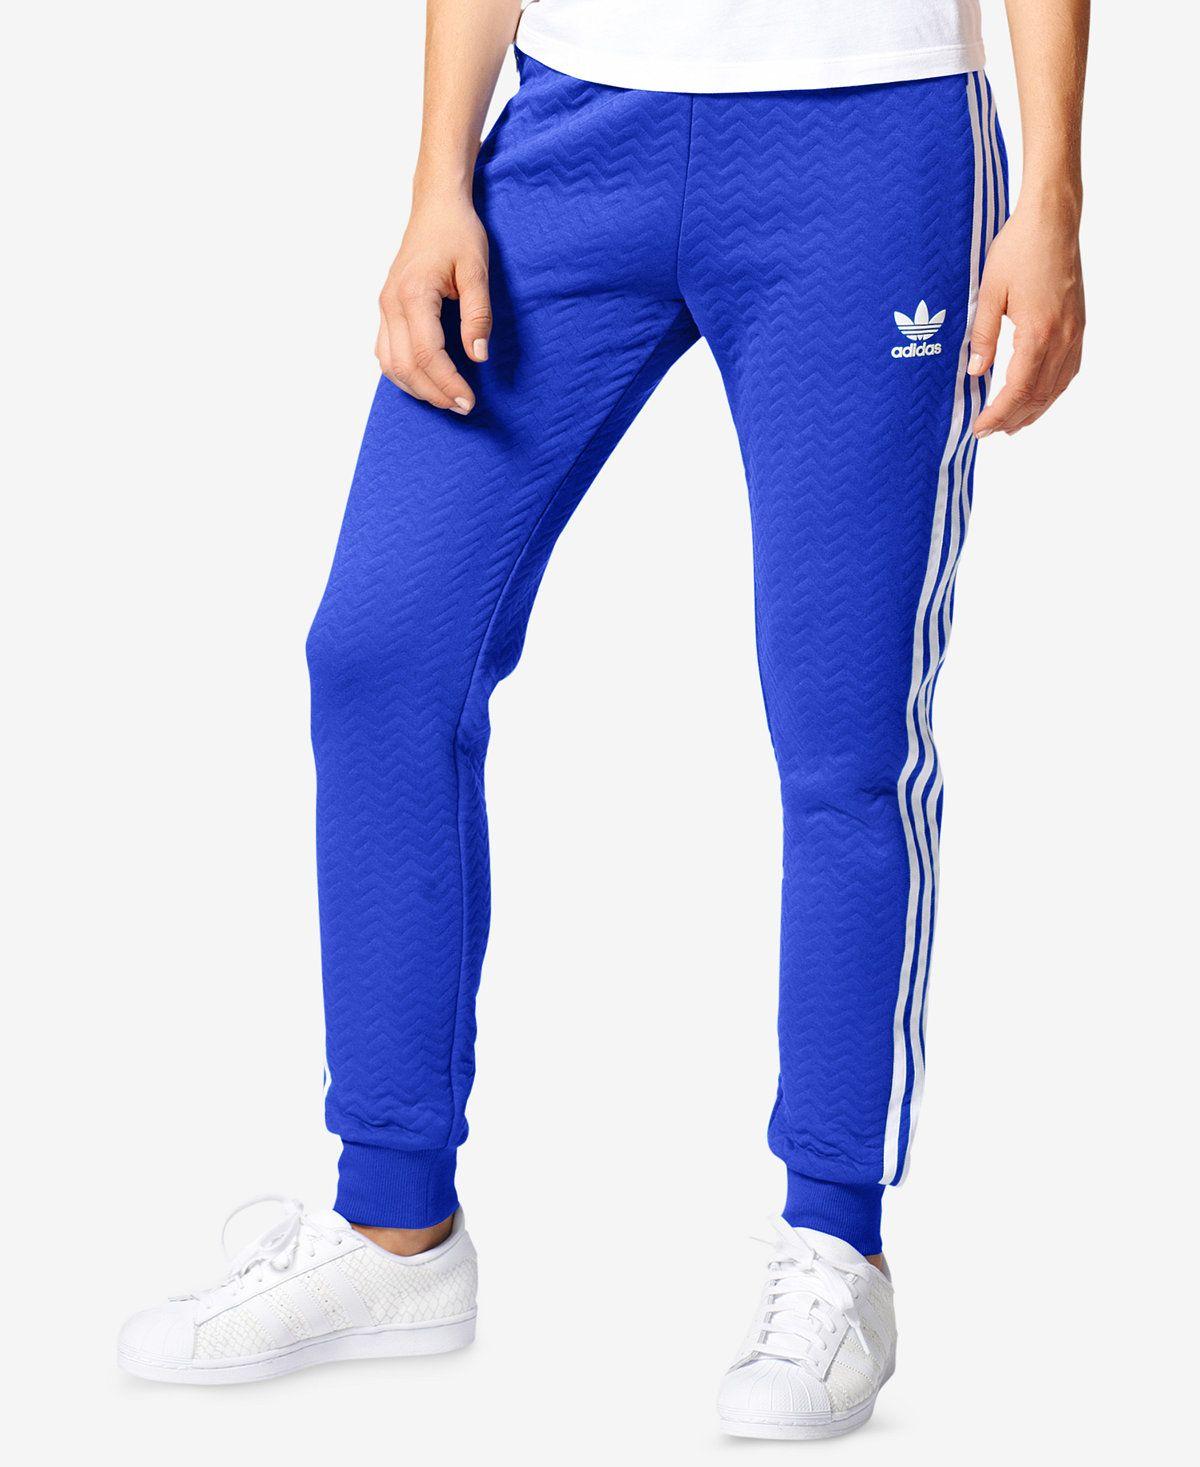 1da6ad96f3 adidas Originals Cuffed Track Pants - Adidas Tracksuit - SLP ...